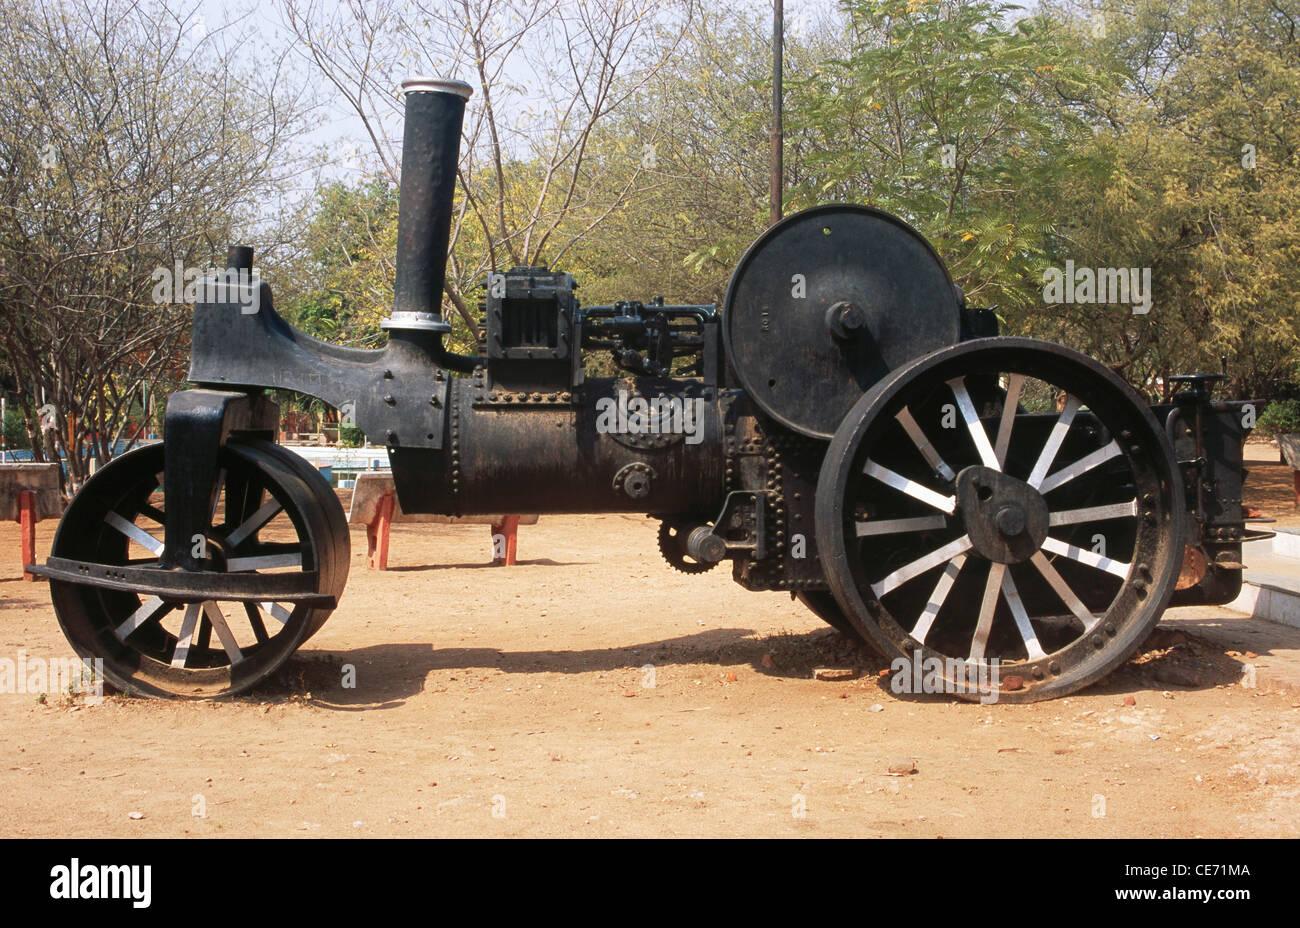 NMK 84200 : old antique steam engine road roller ; laxmibai park ; jhansi ; uttar pradesh ; India Stock Photo